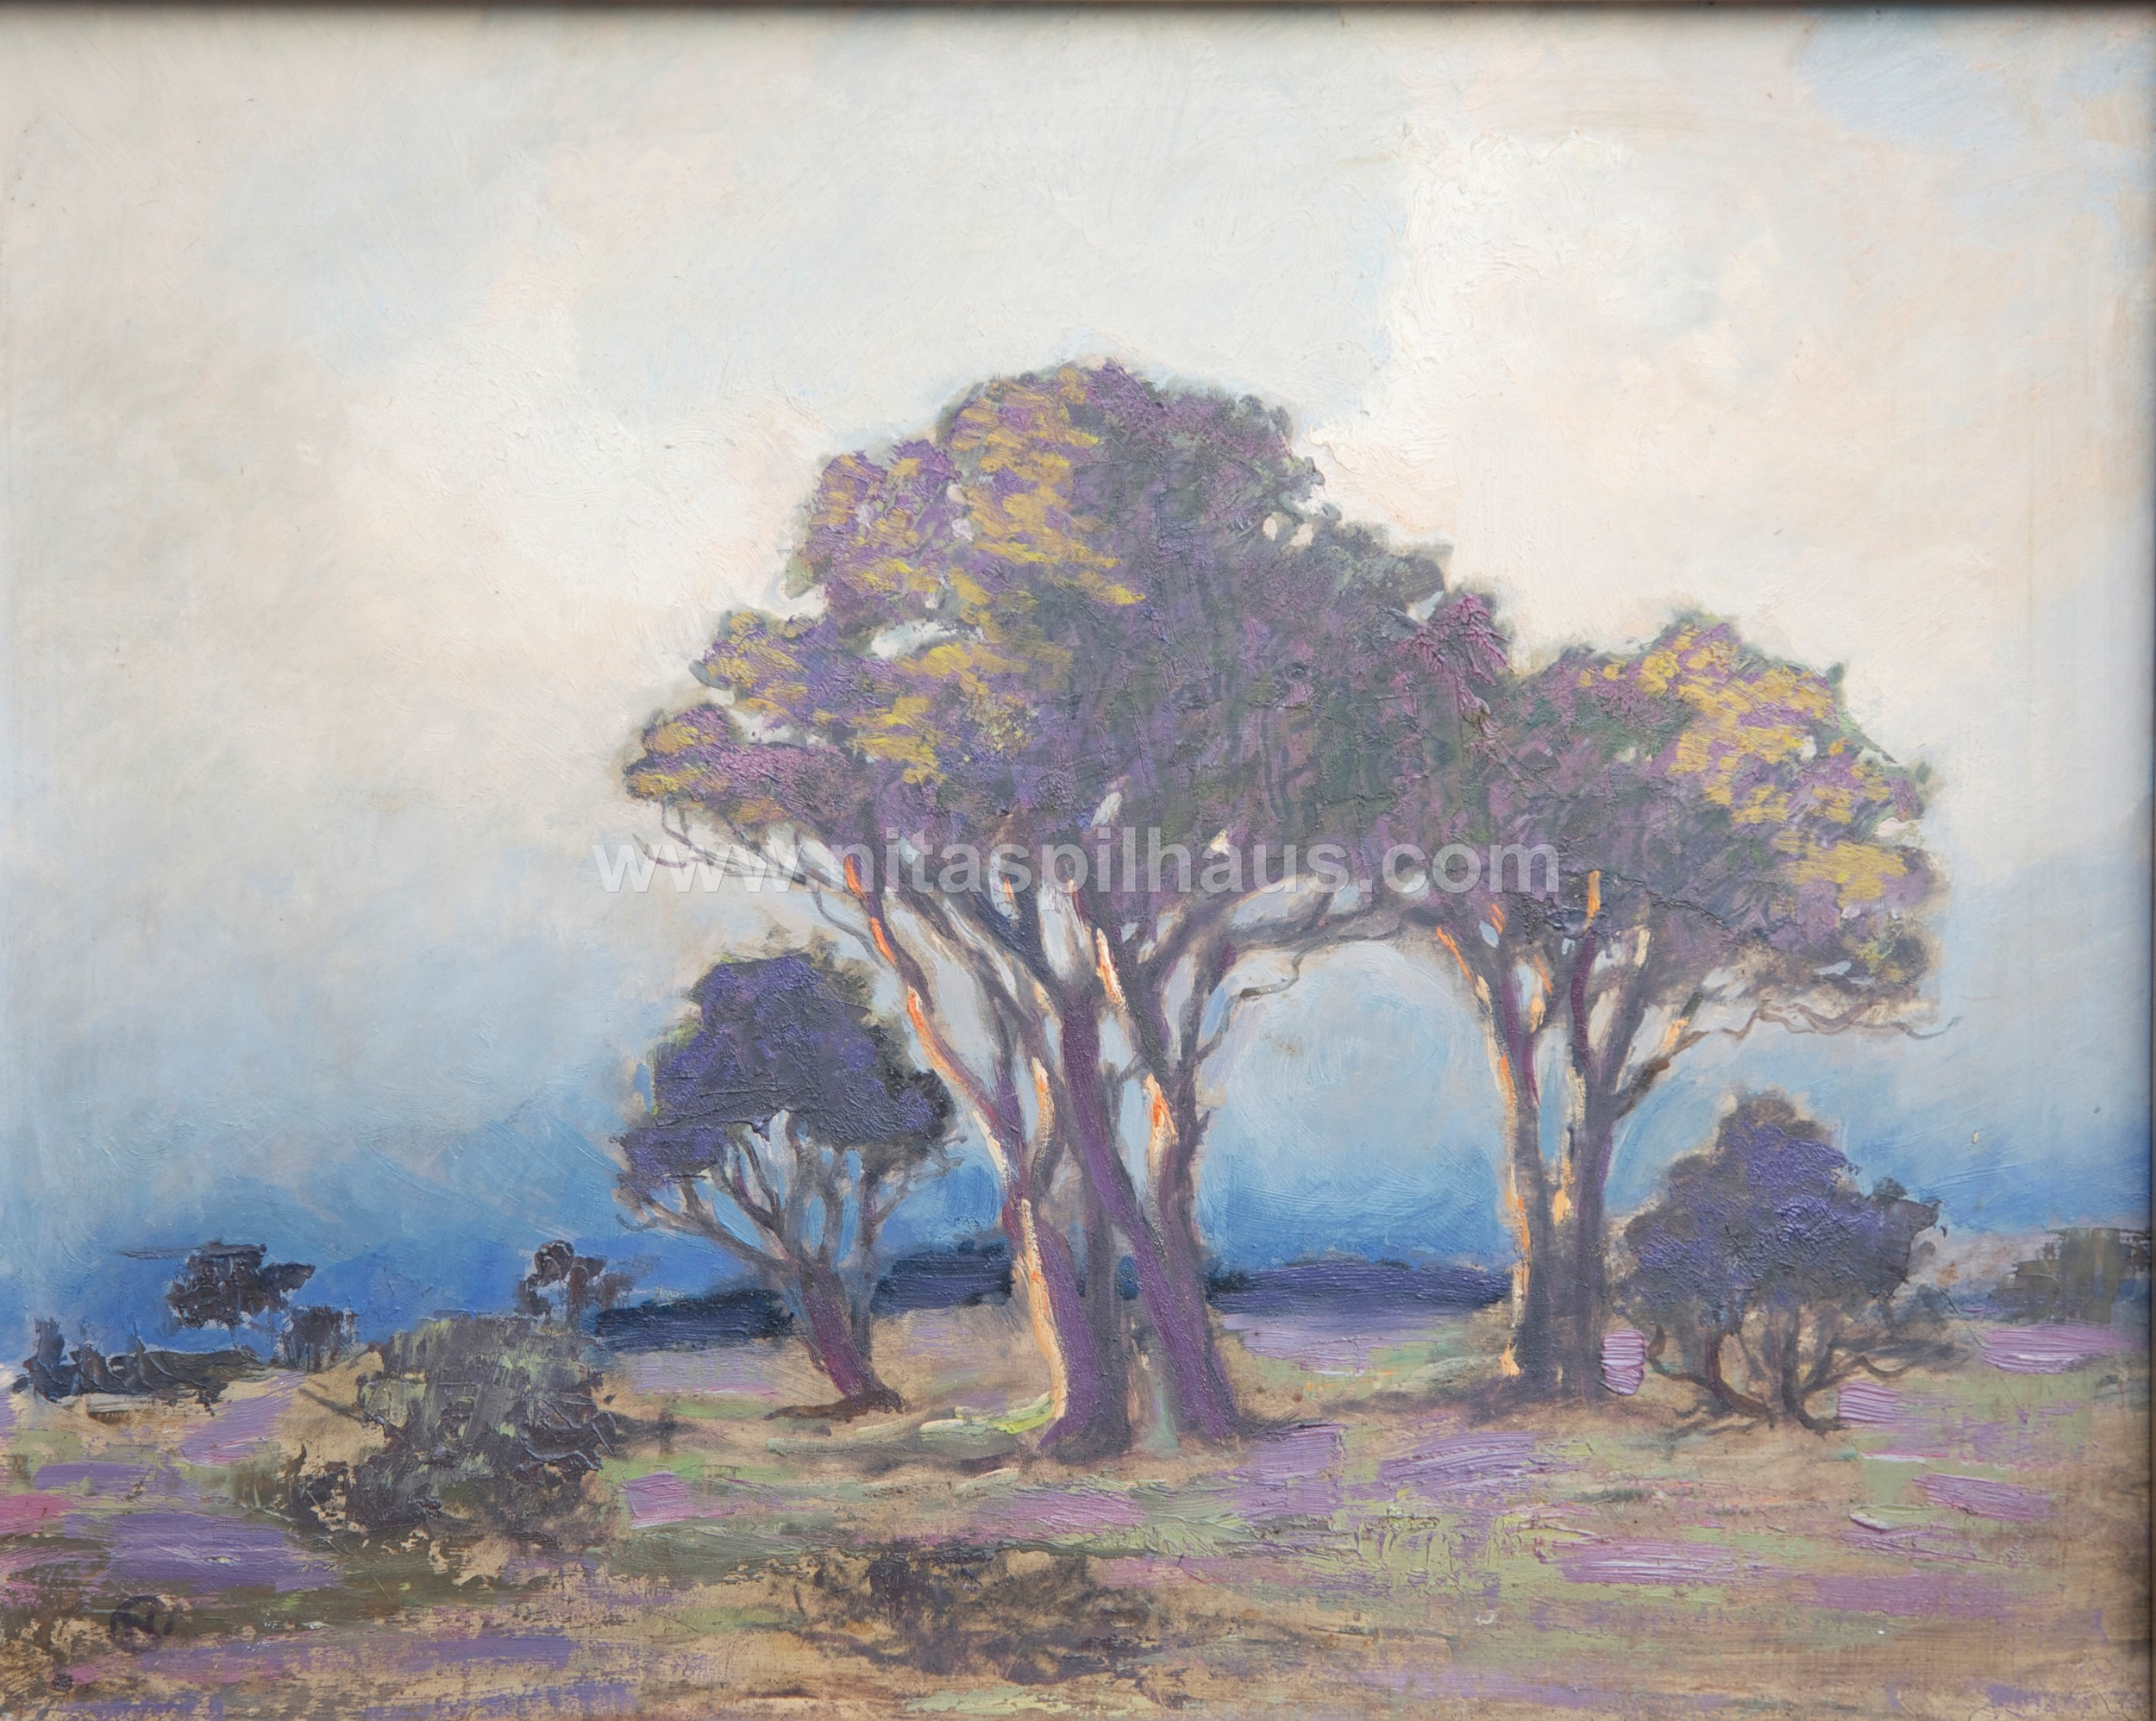 Trees, c 1955, Oil, h 39.3 cm x w 48.7 cm,Collector 29